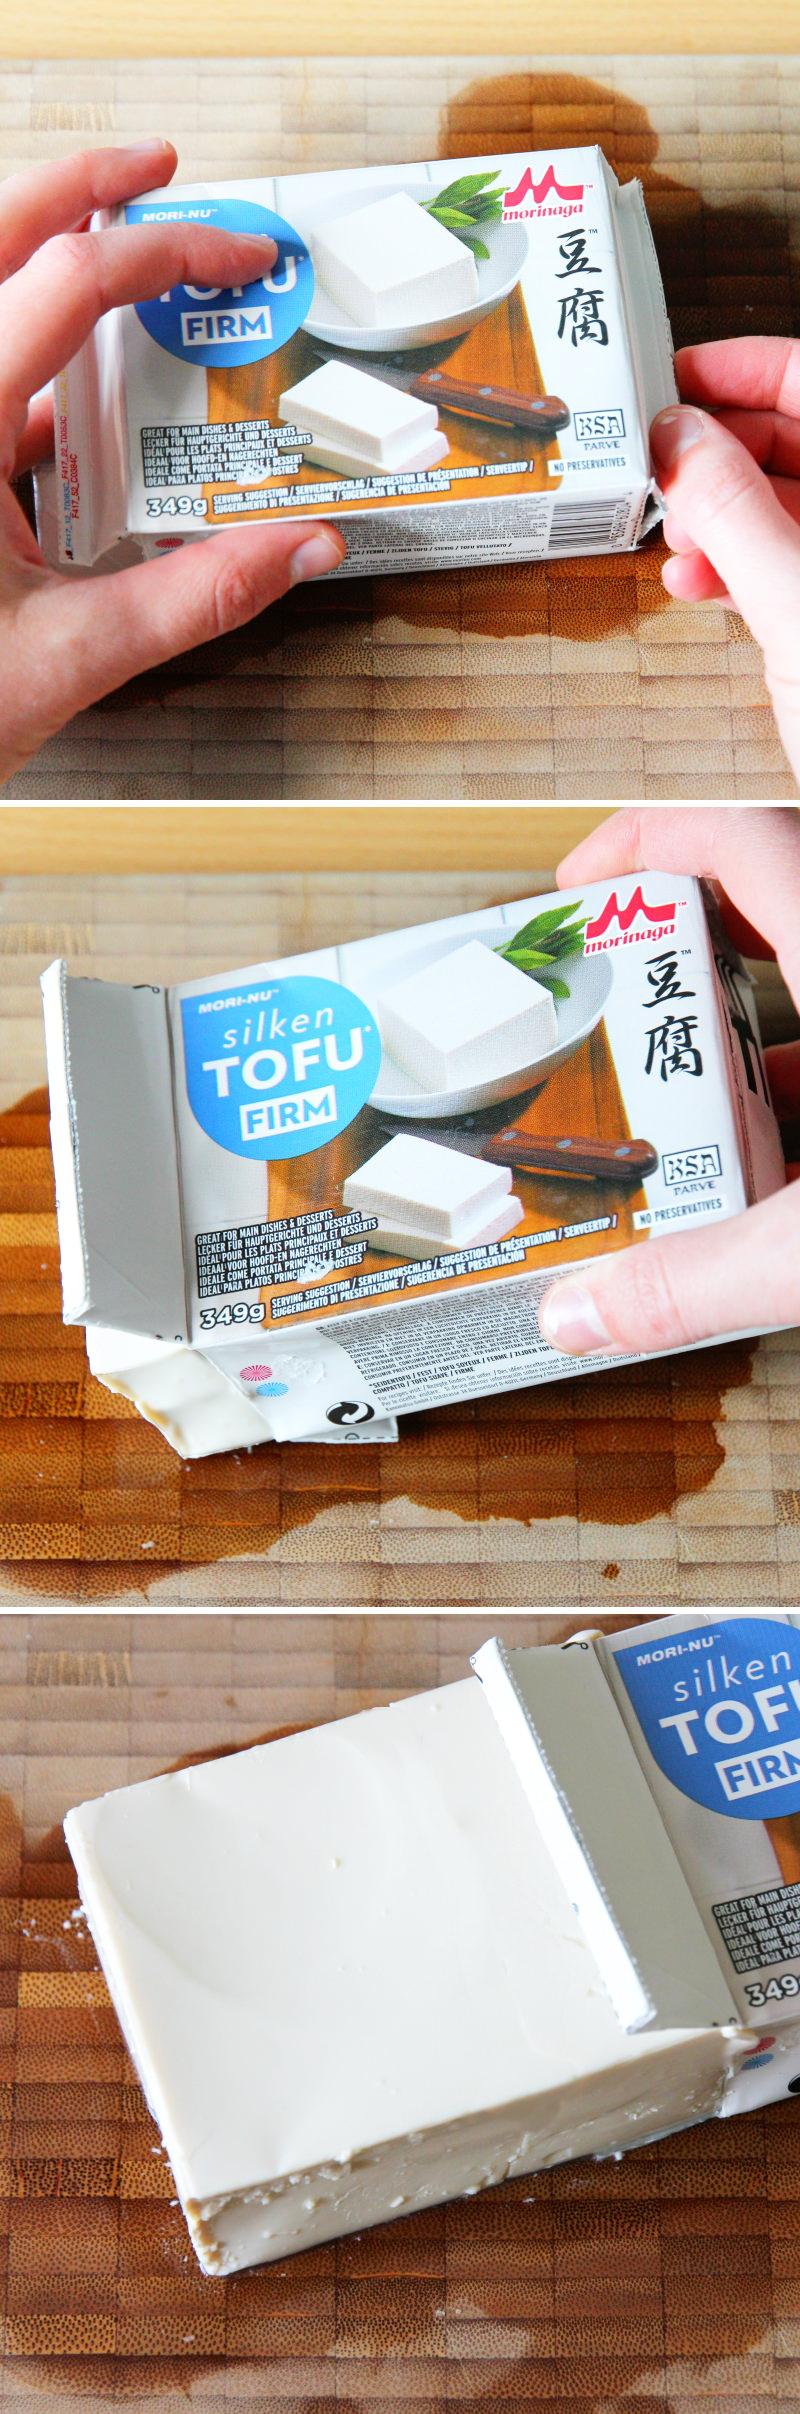 Tofu Verpackung öffnen Schritt 4